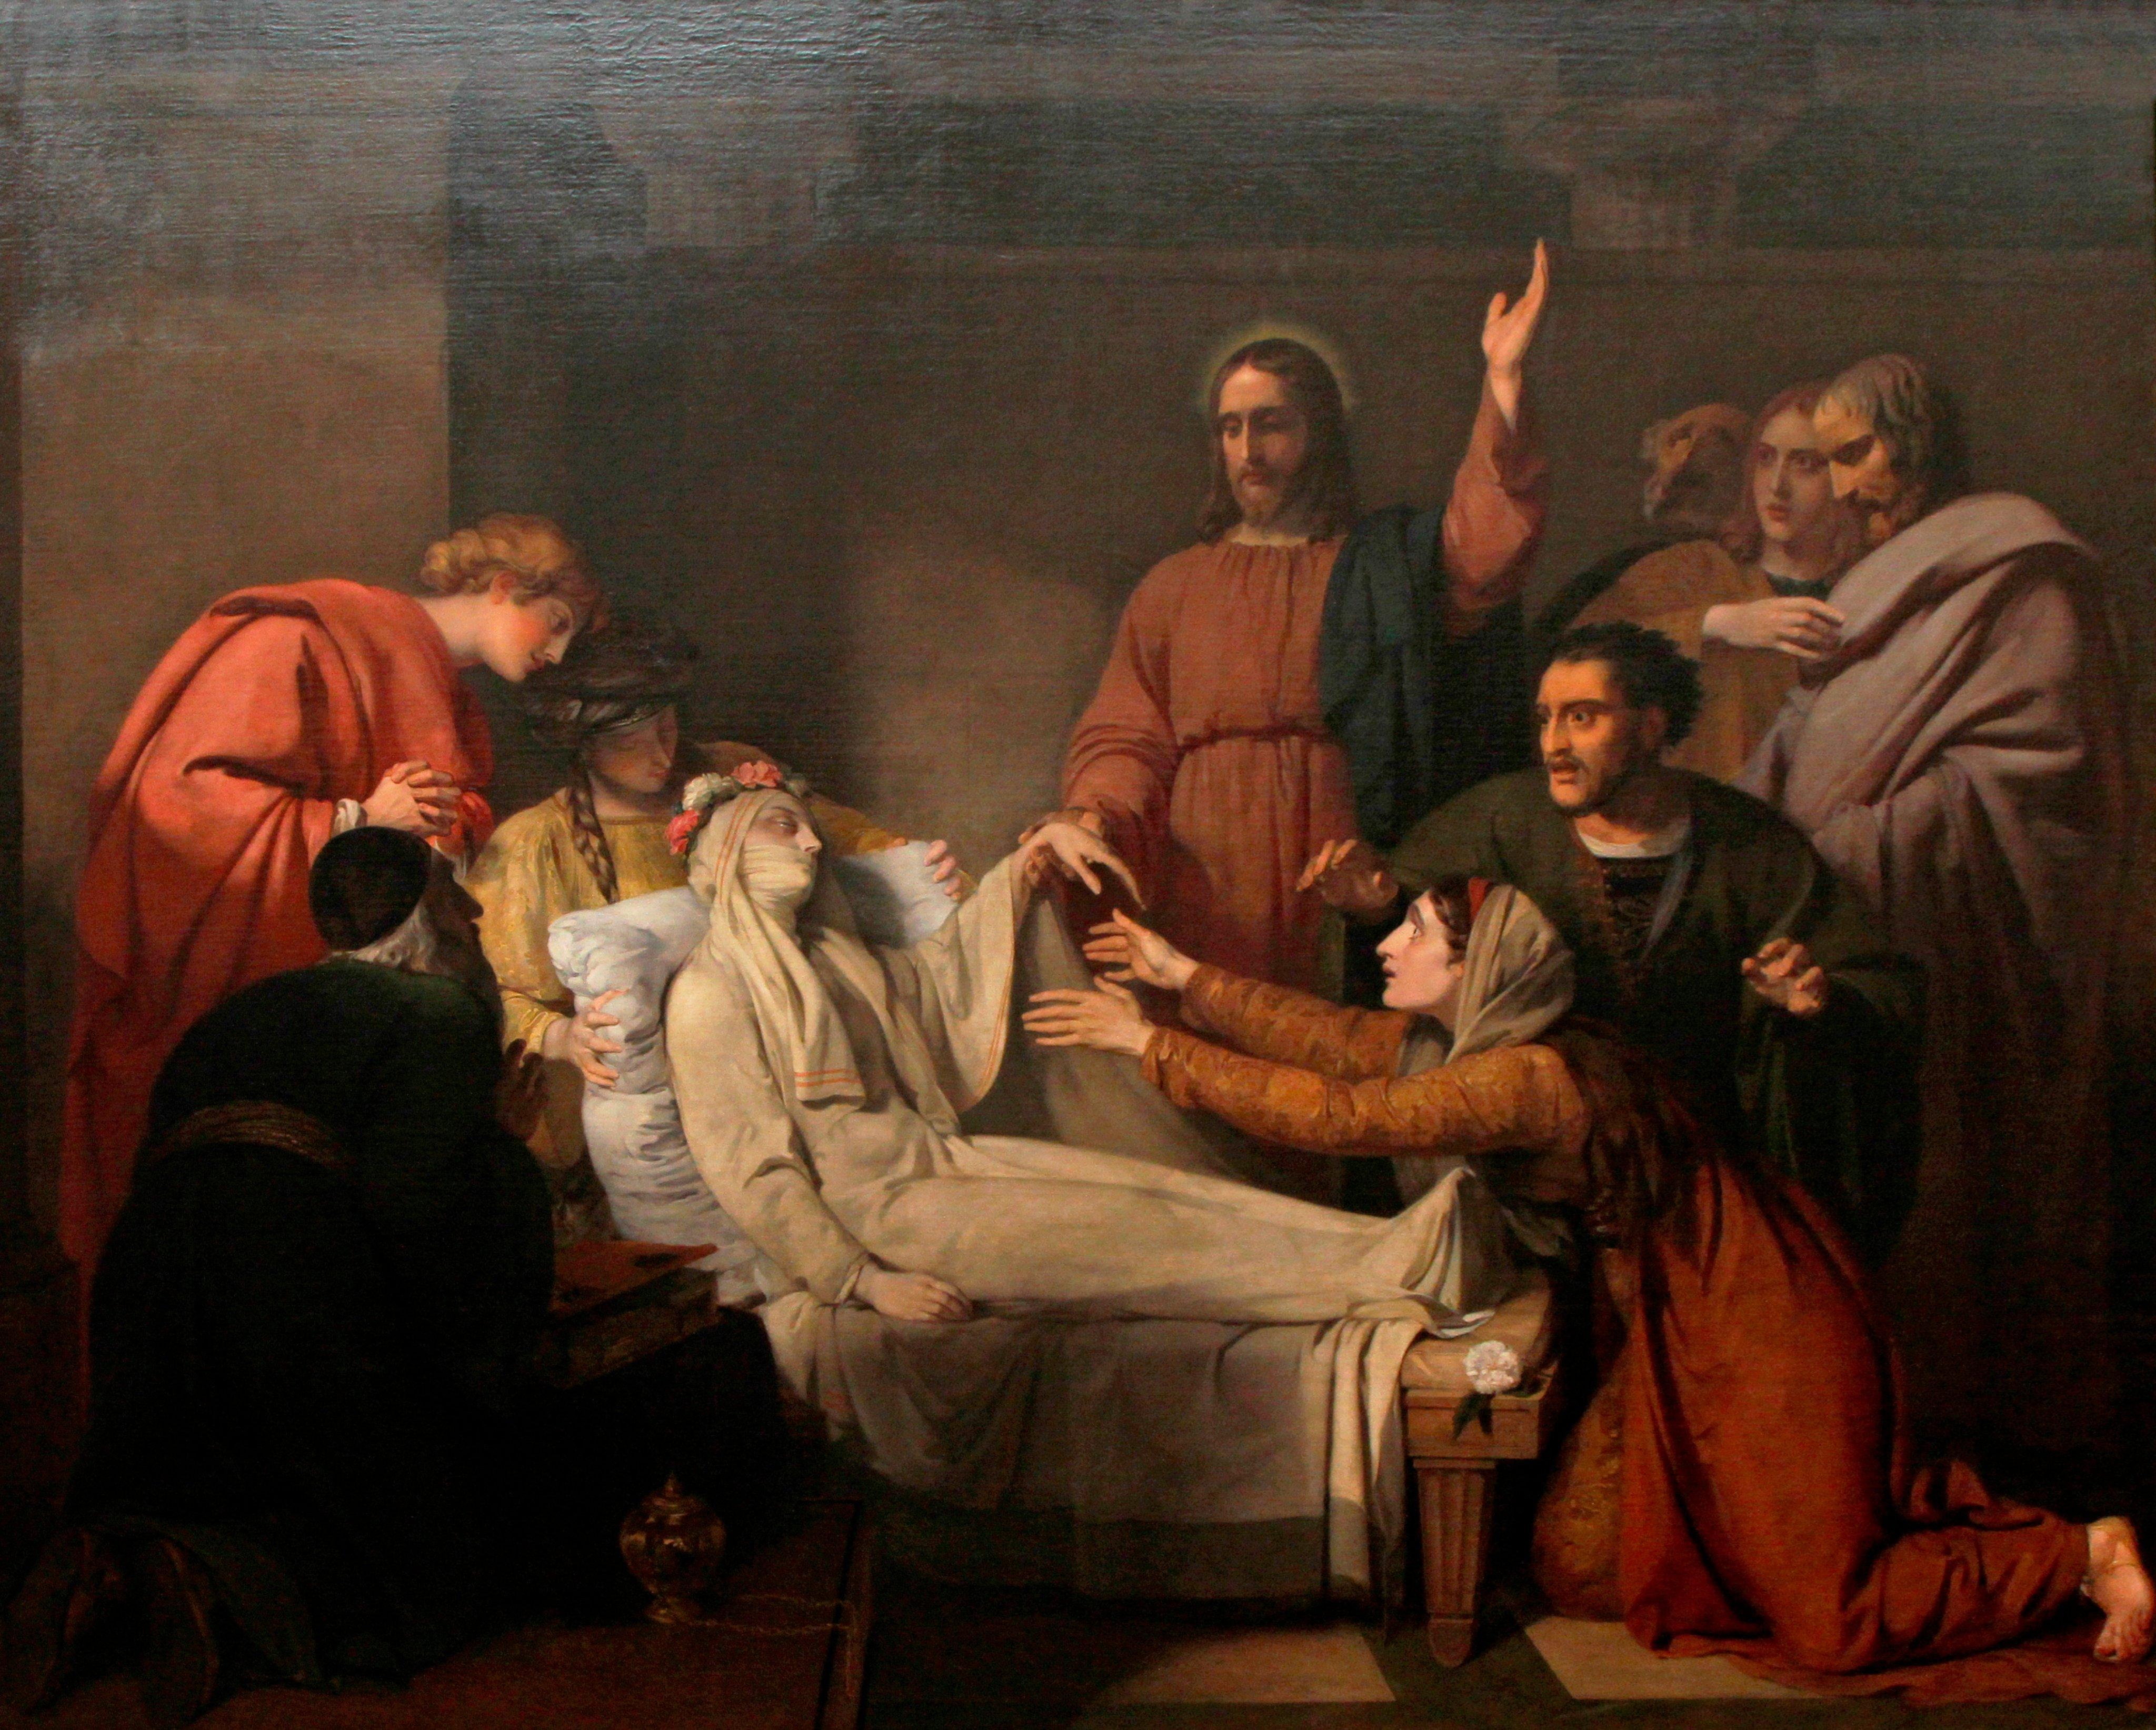 Jesus Cristo ressuscita a filha de Jairo